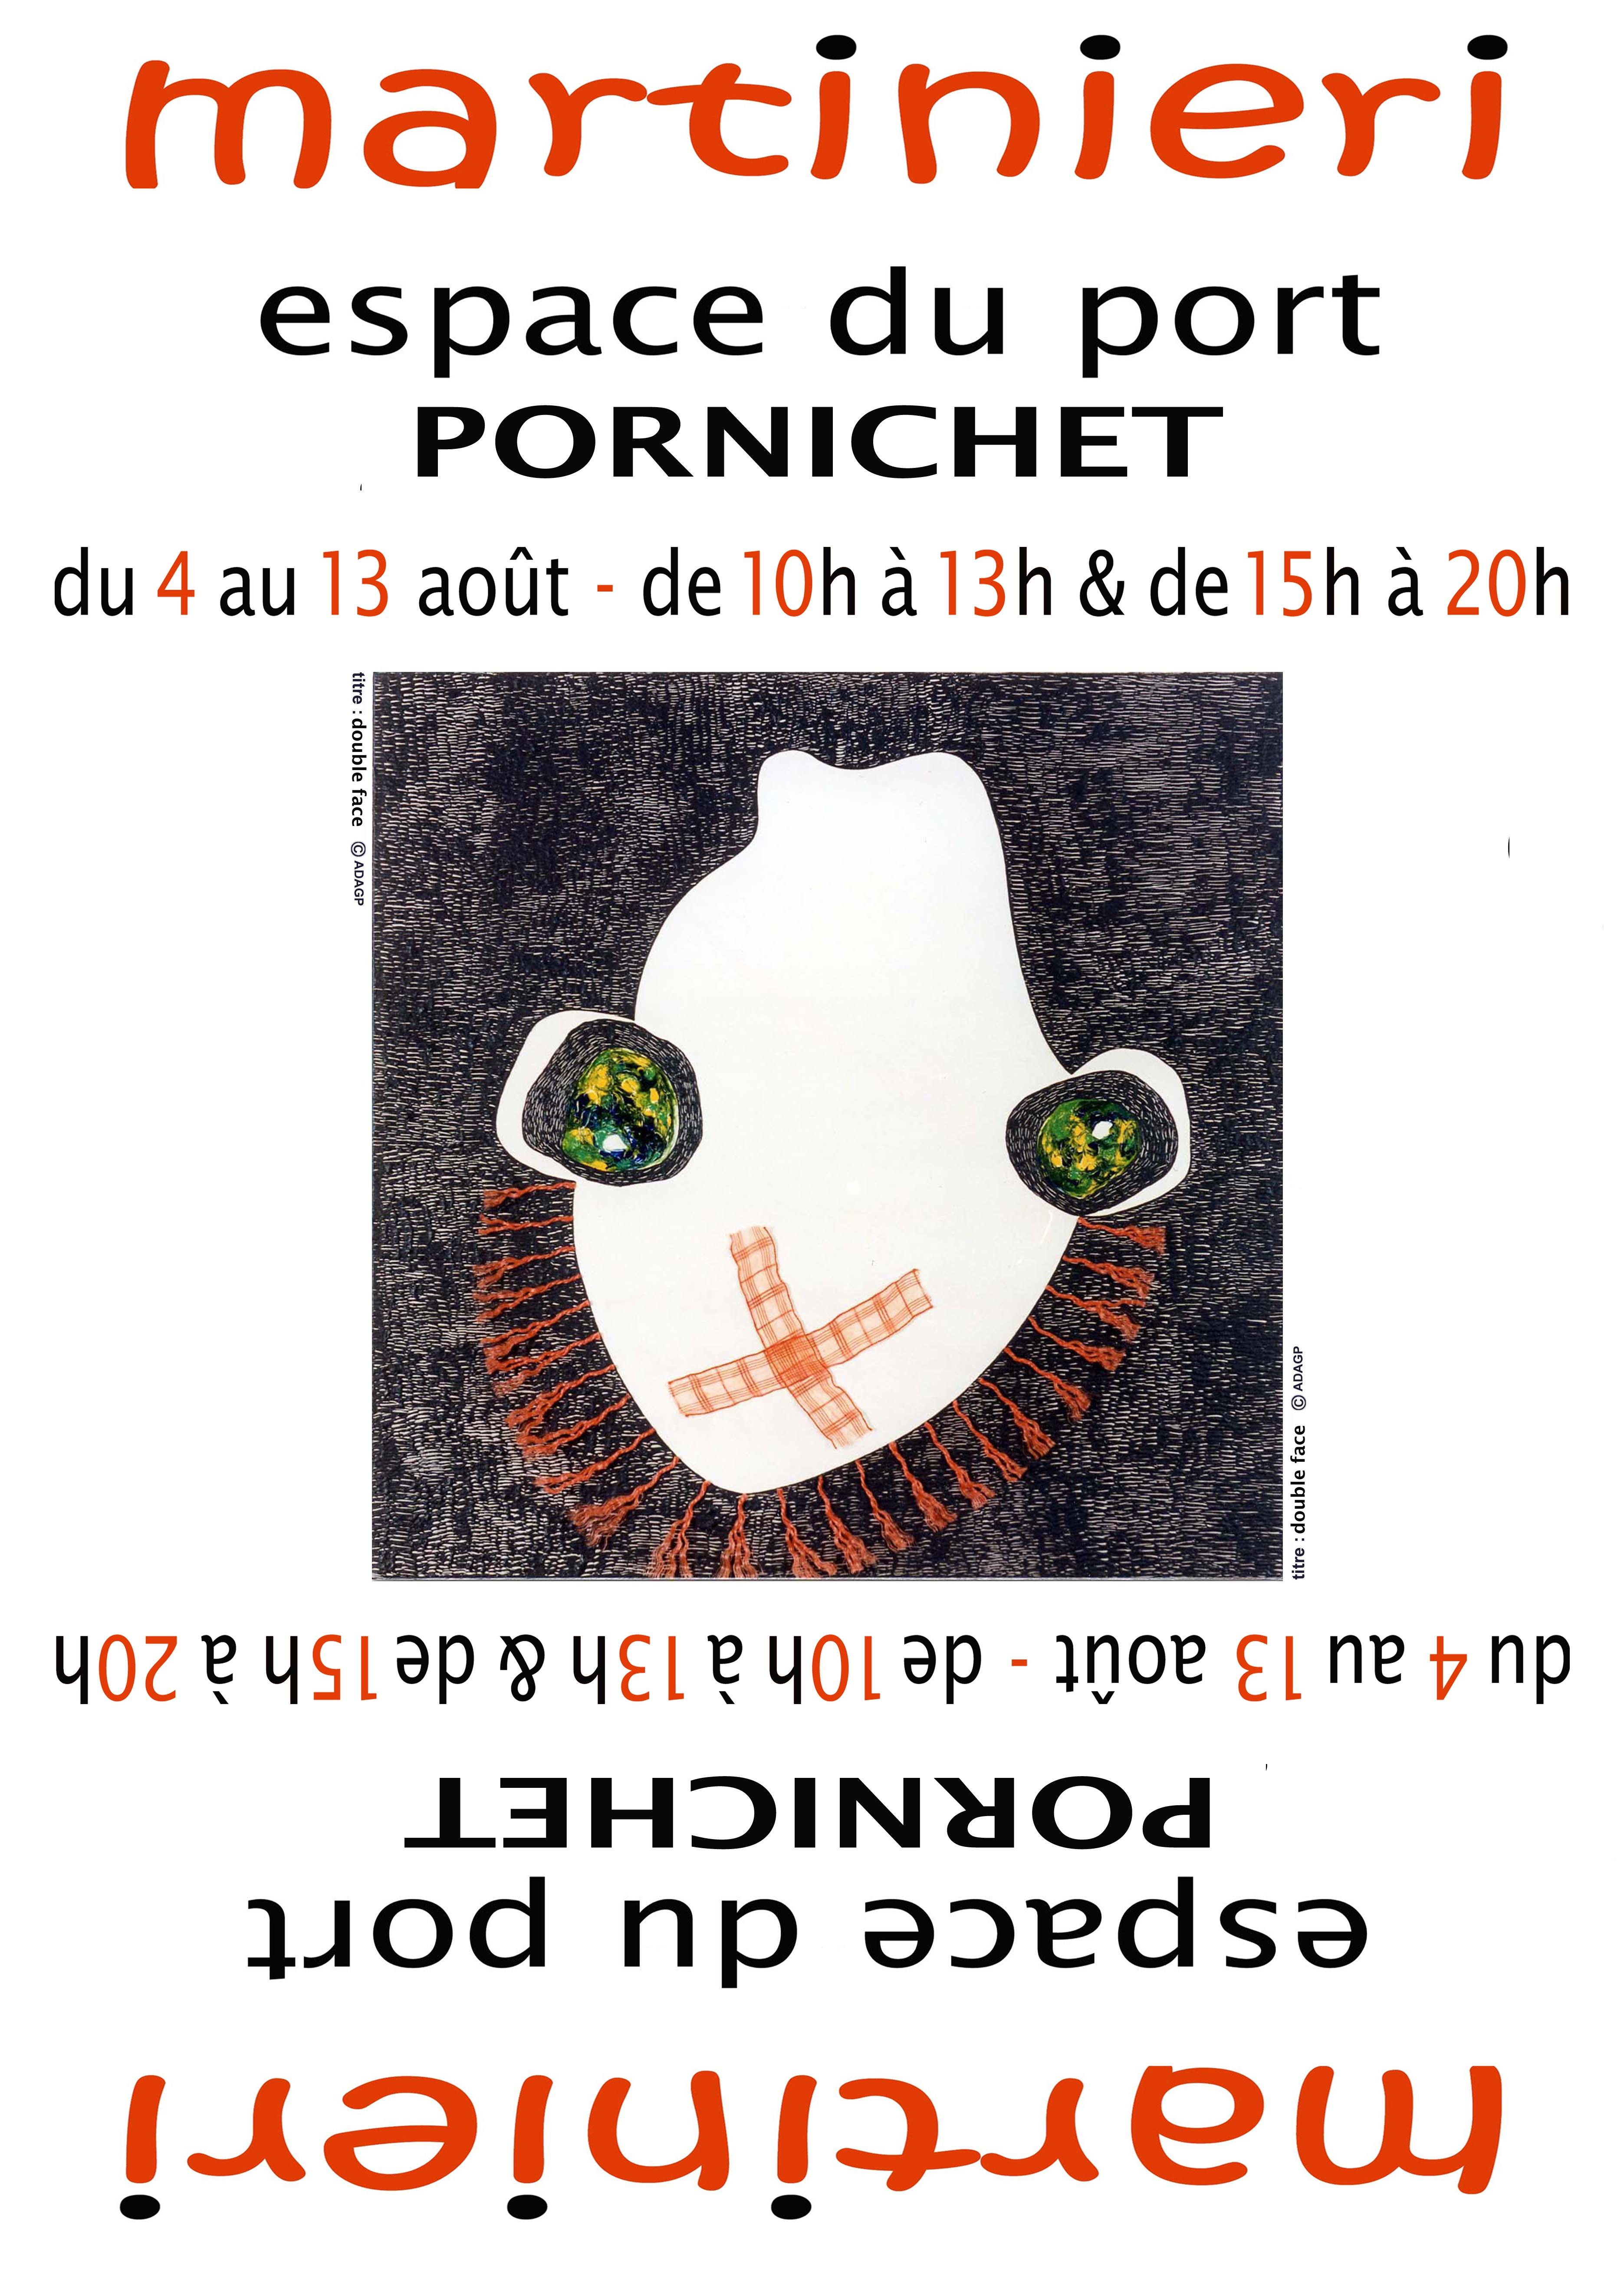 Exposition, Martinieri, Pornichet